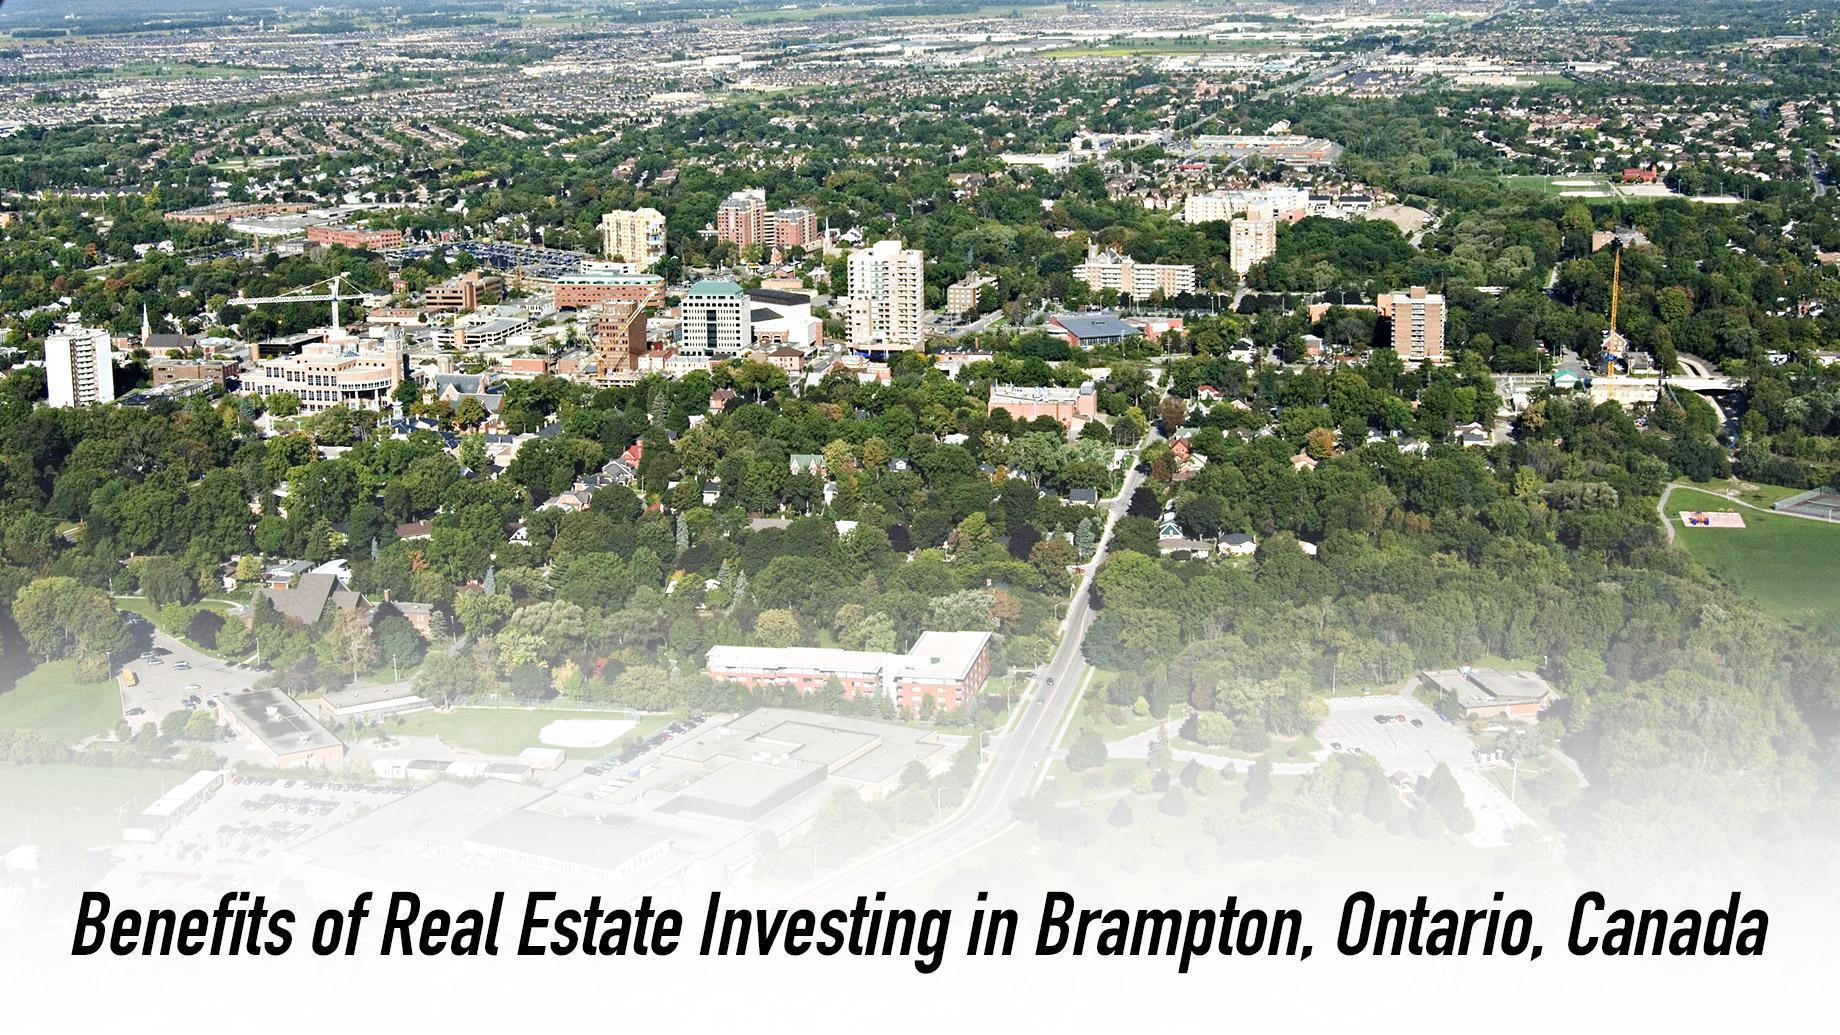 Benefits of Real Estate Investing in Brampton, Ontario, Canada